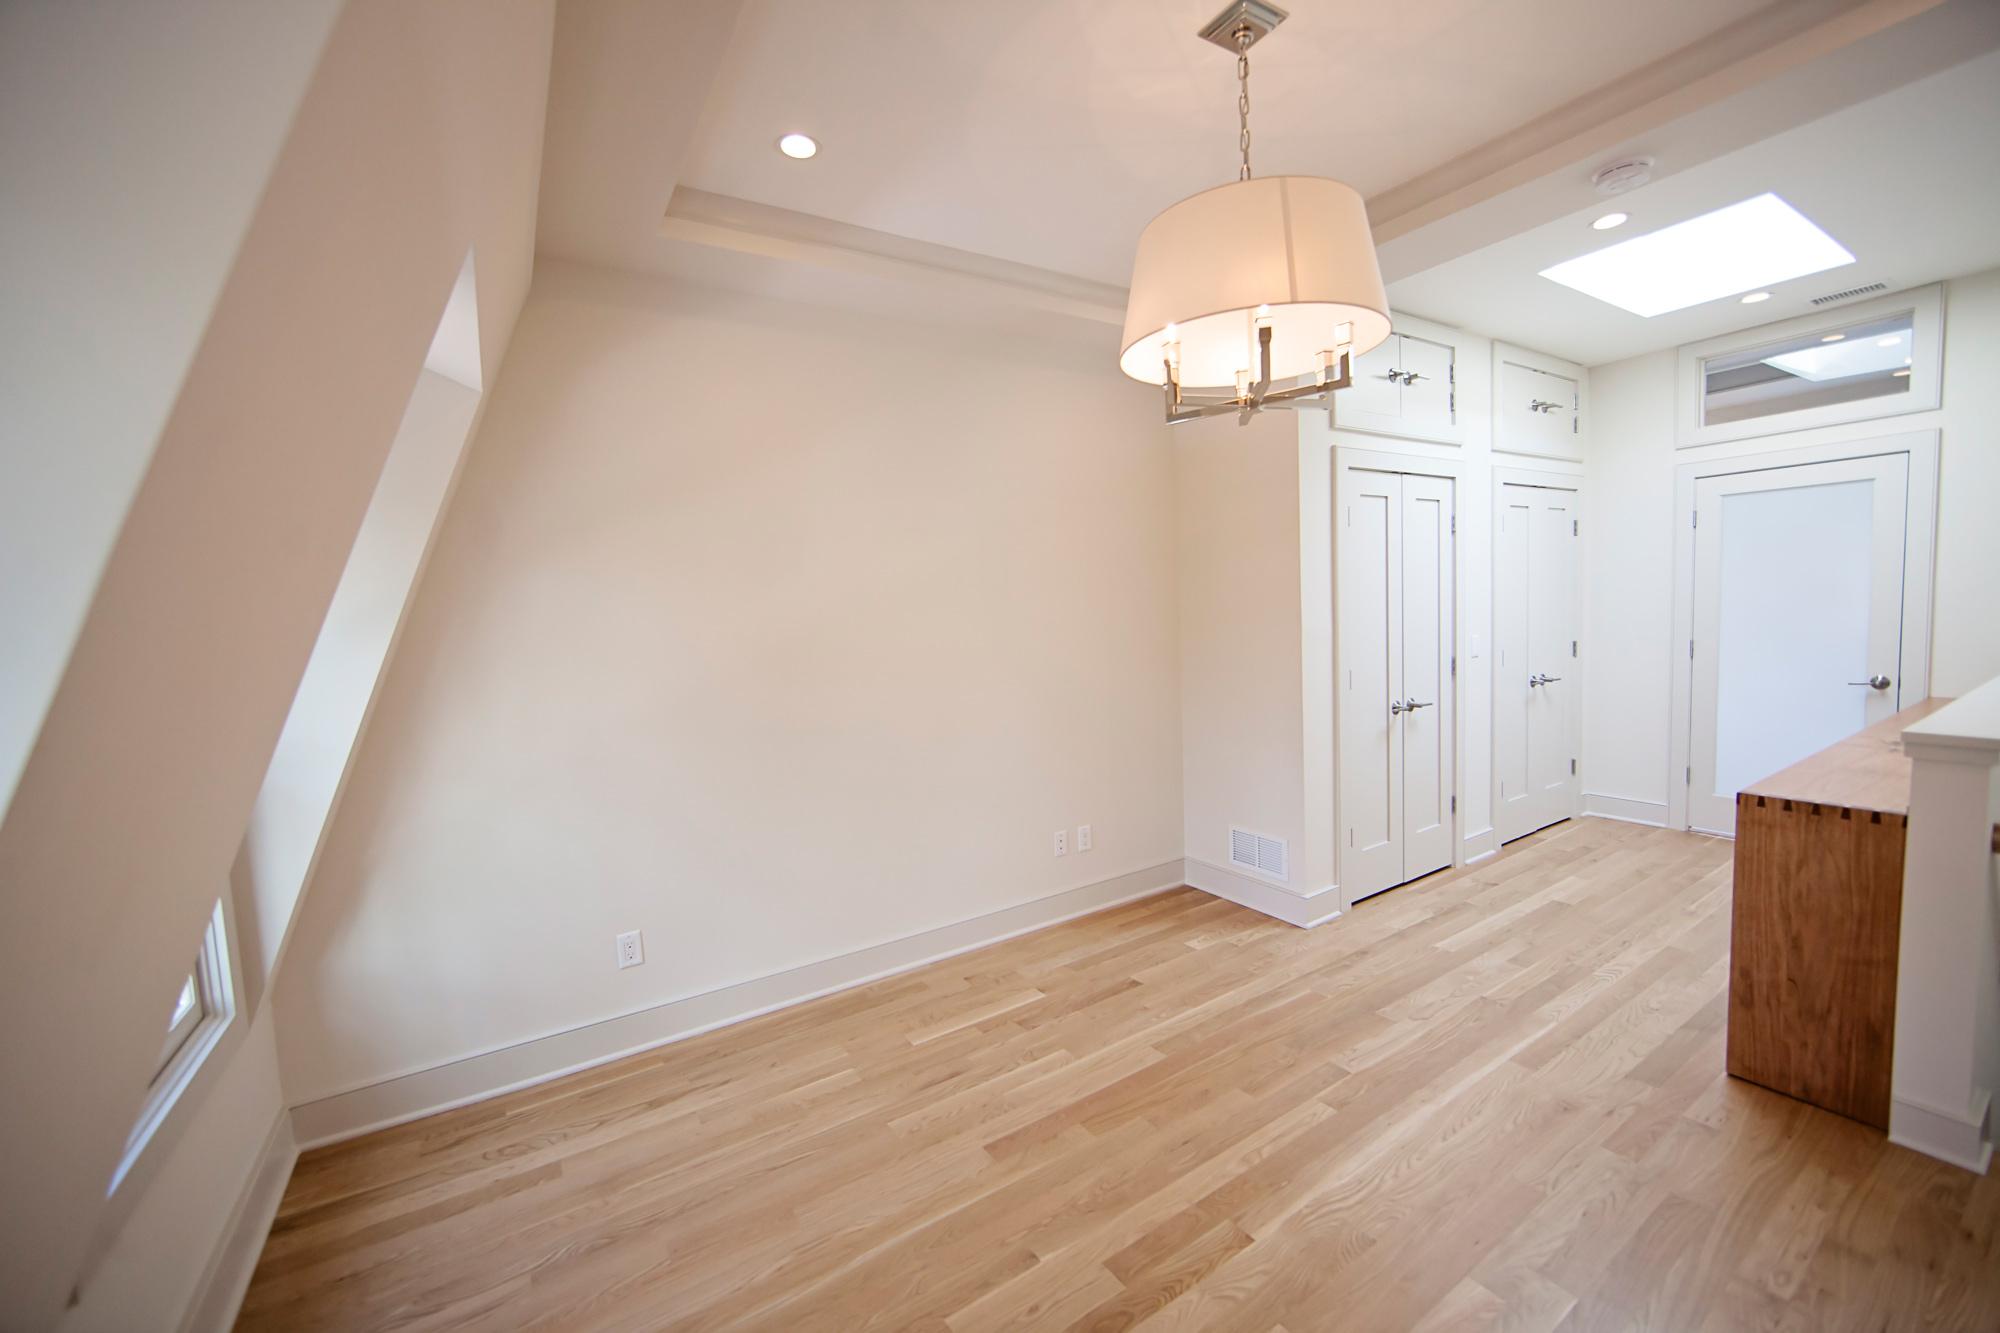 thompson-fine-home-renovations-hoboken-new-jersey-construction-6.jpg